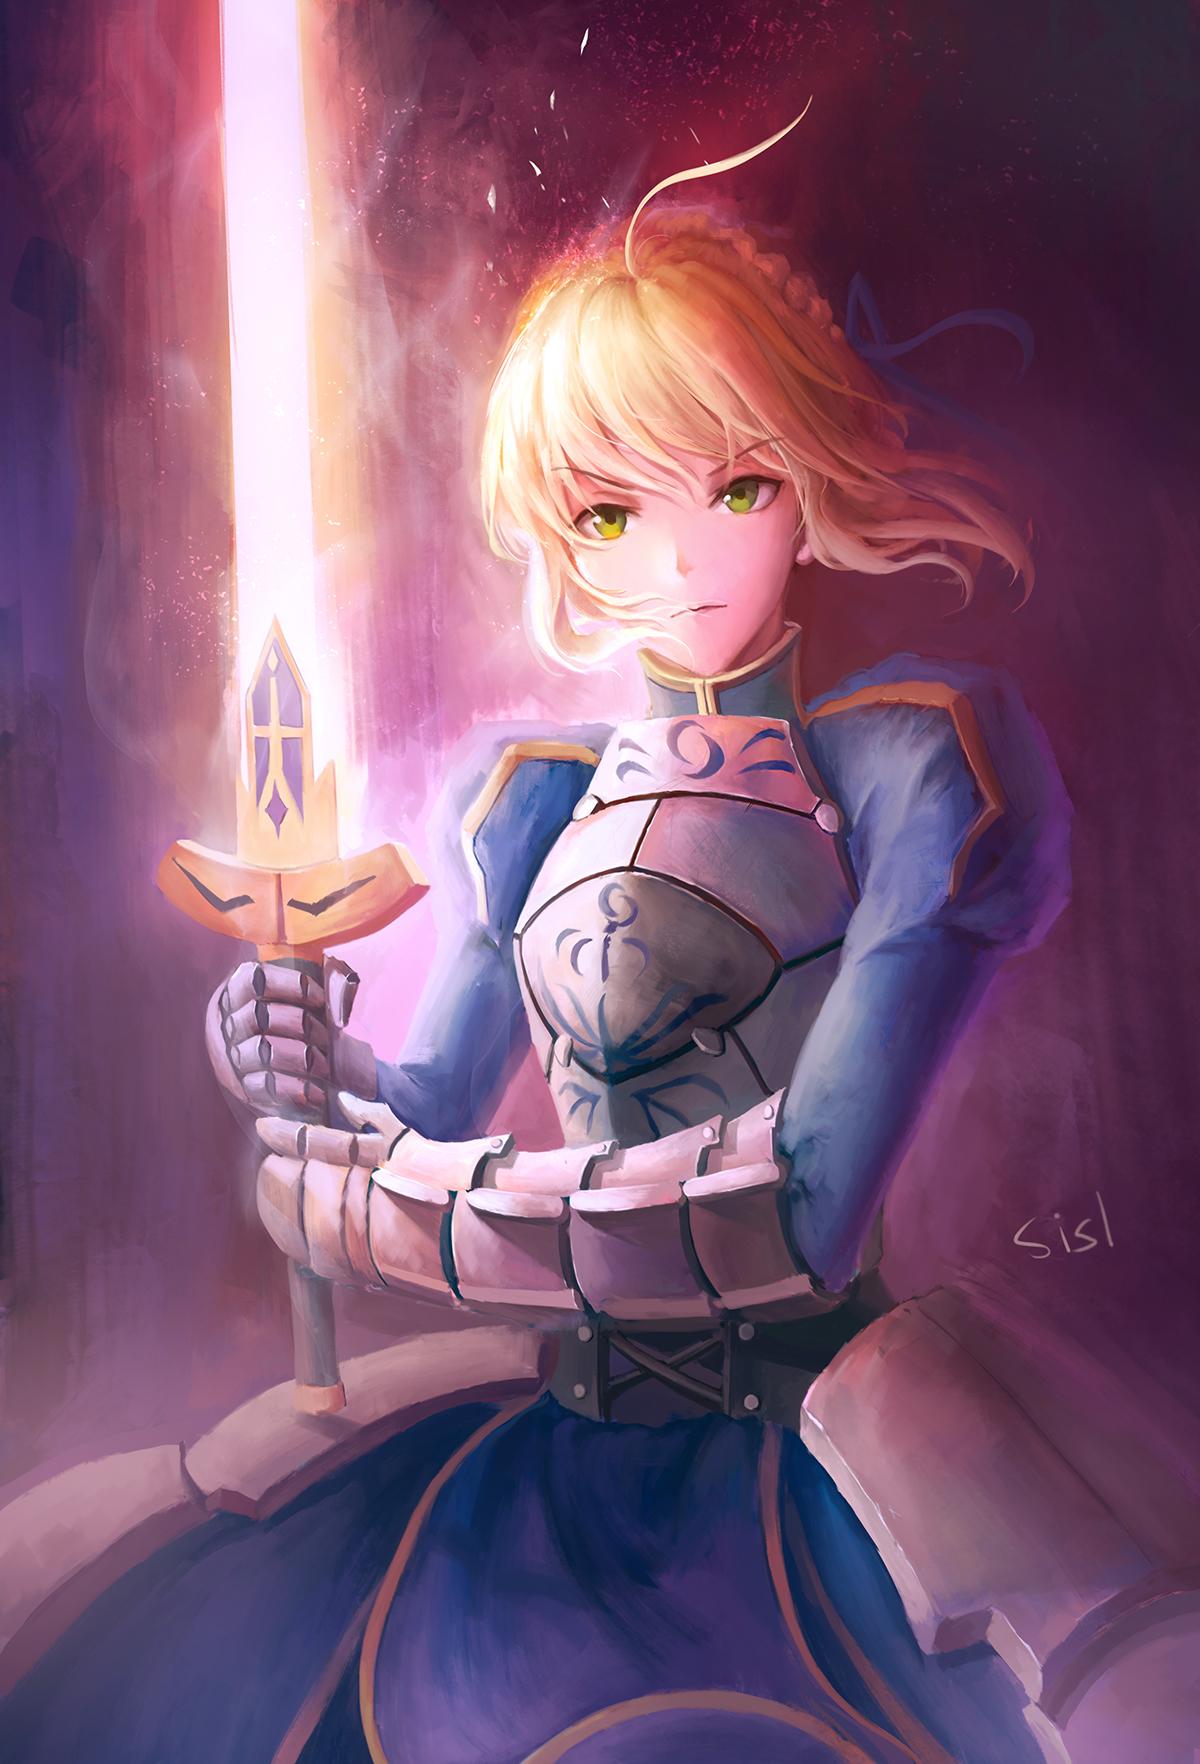 night anime Fate/stay